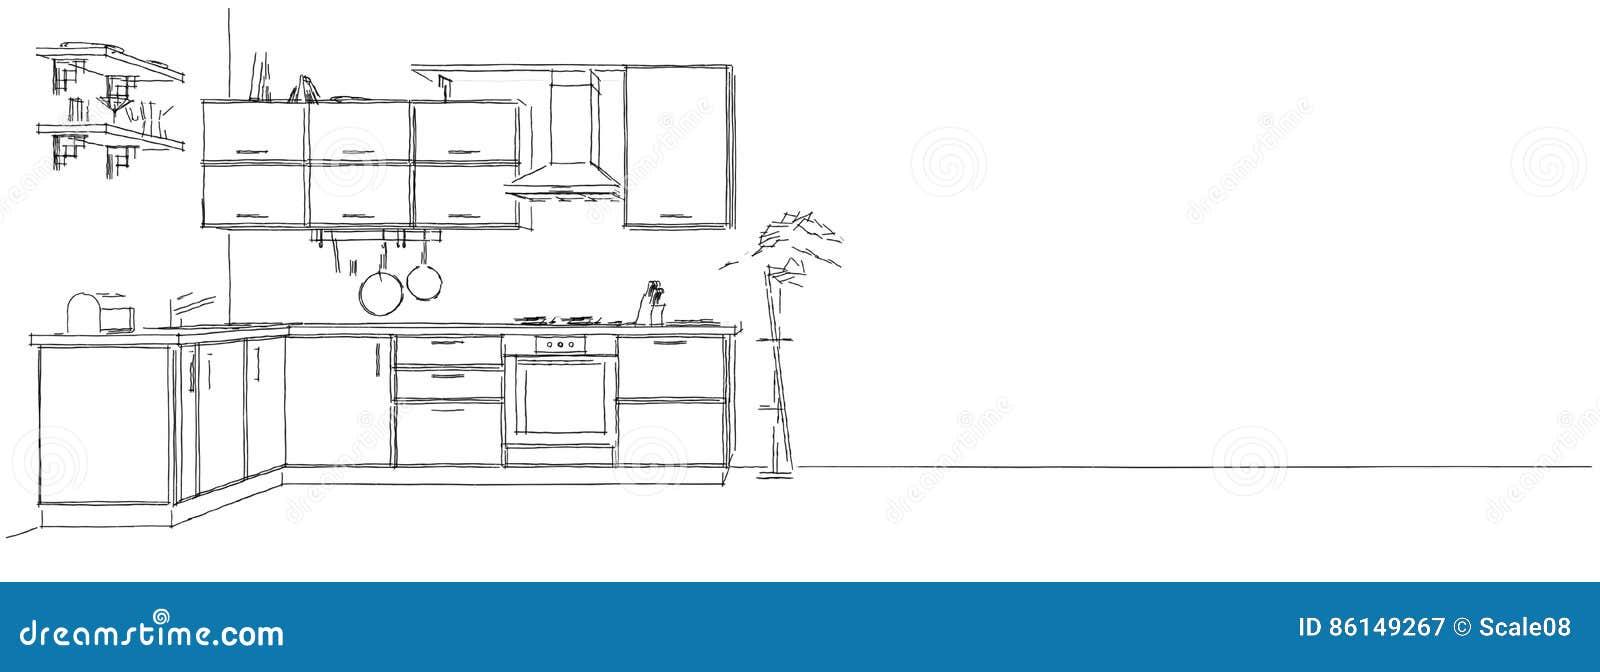 Disegni Di Cucine Ad Angolo. Stunning Cucina With Disegni Di Cucine ...